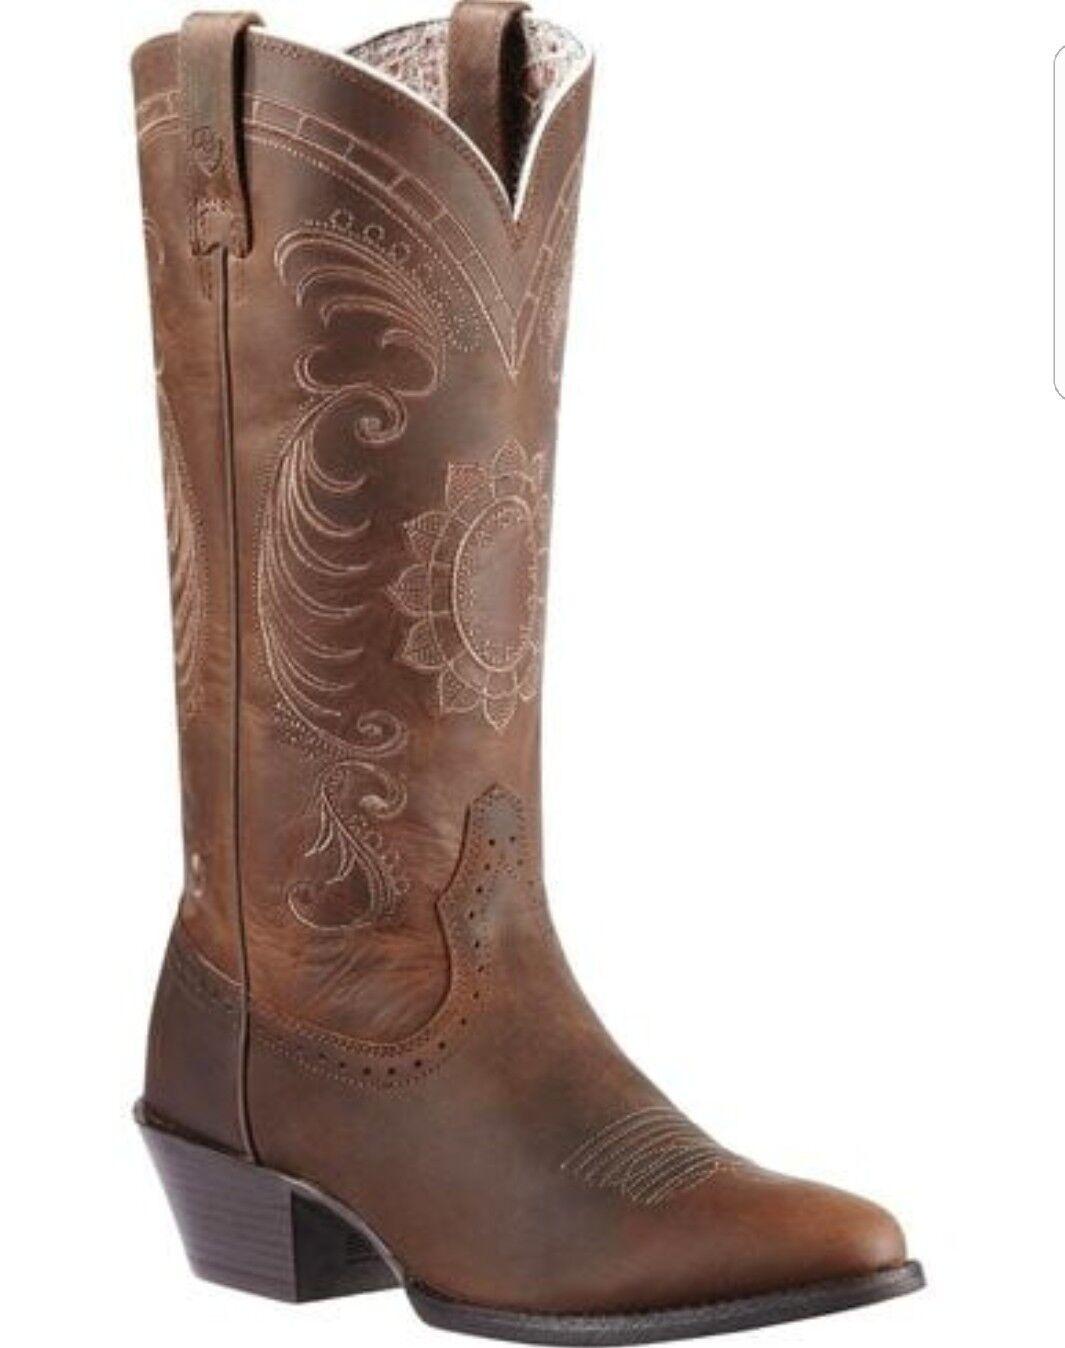 Ariat Magnolia Sunflower Stitch Cowgirl Boots - - - Medium Toe 02f010